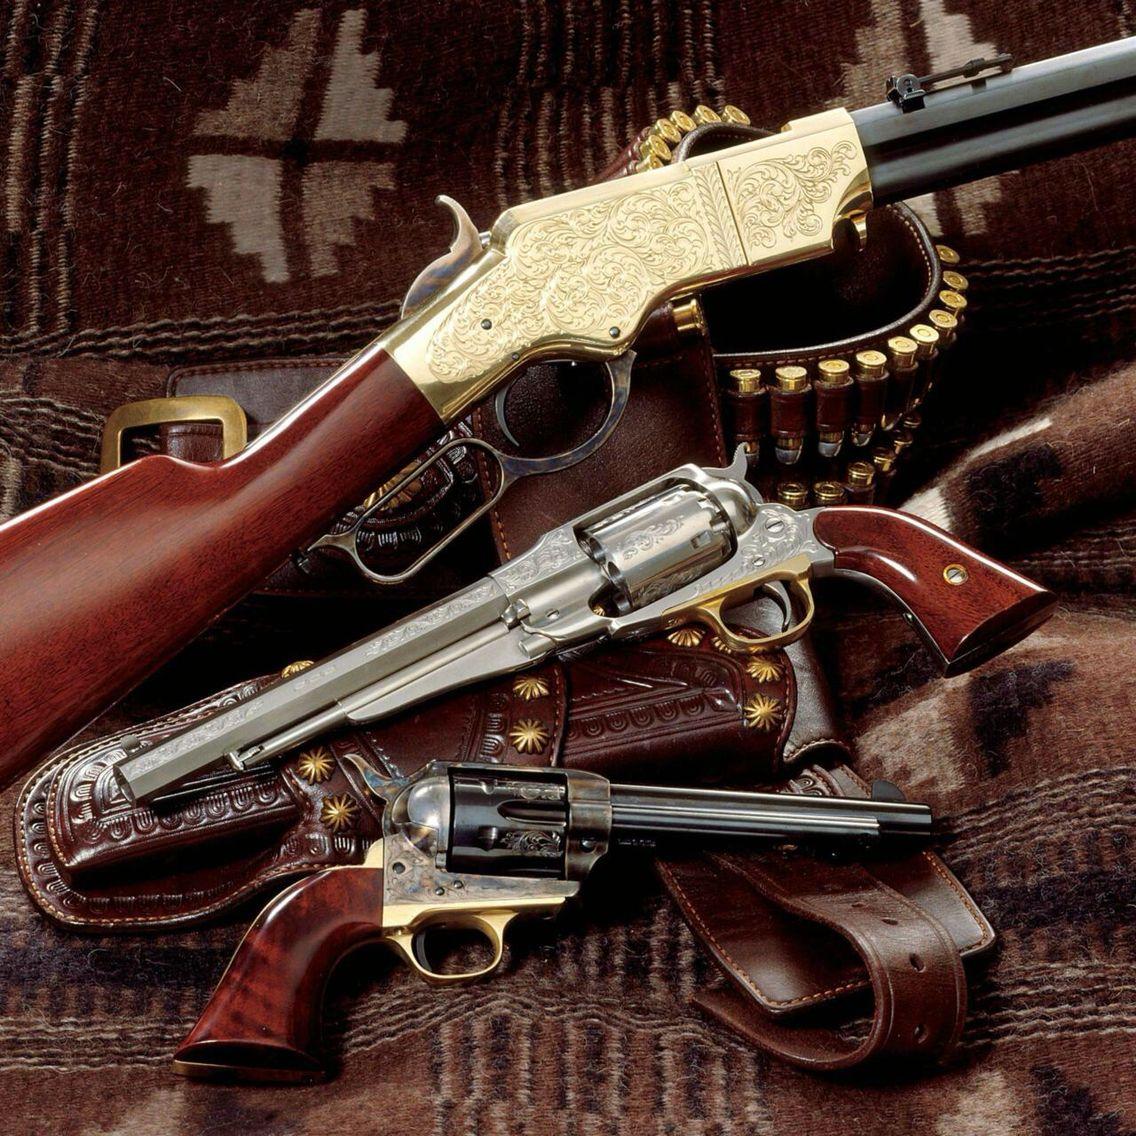 Lovačko oružje i municija - Page 5 Bdc7a25d86a7ea7deae649d988b23d9e